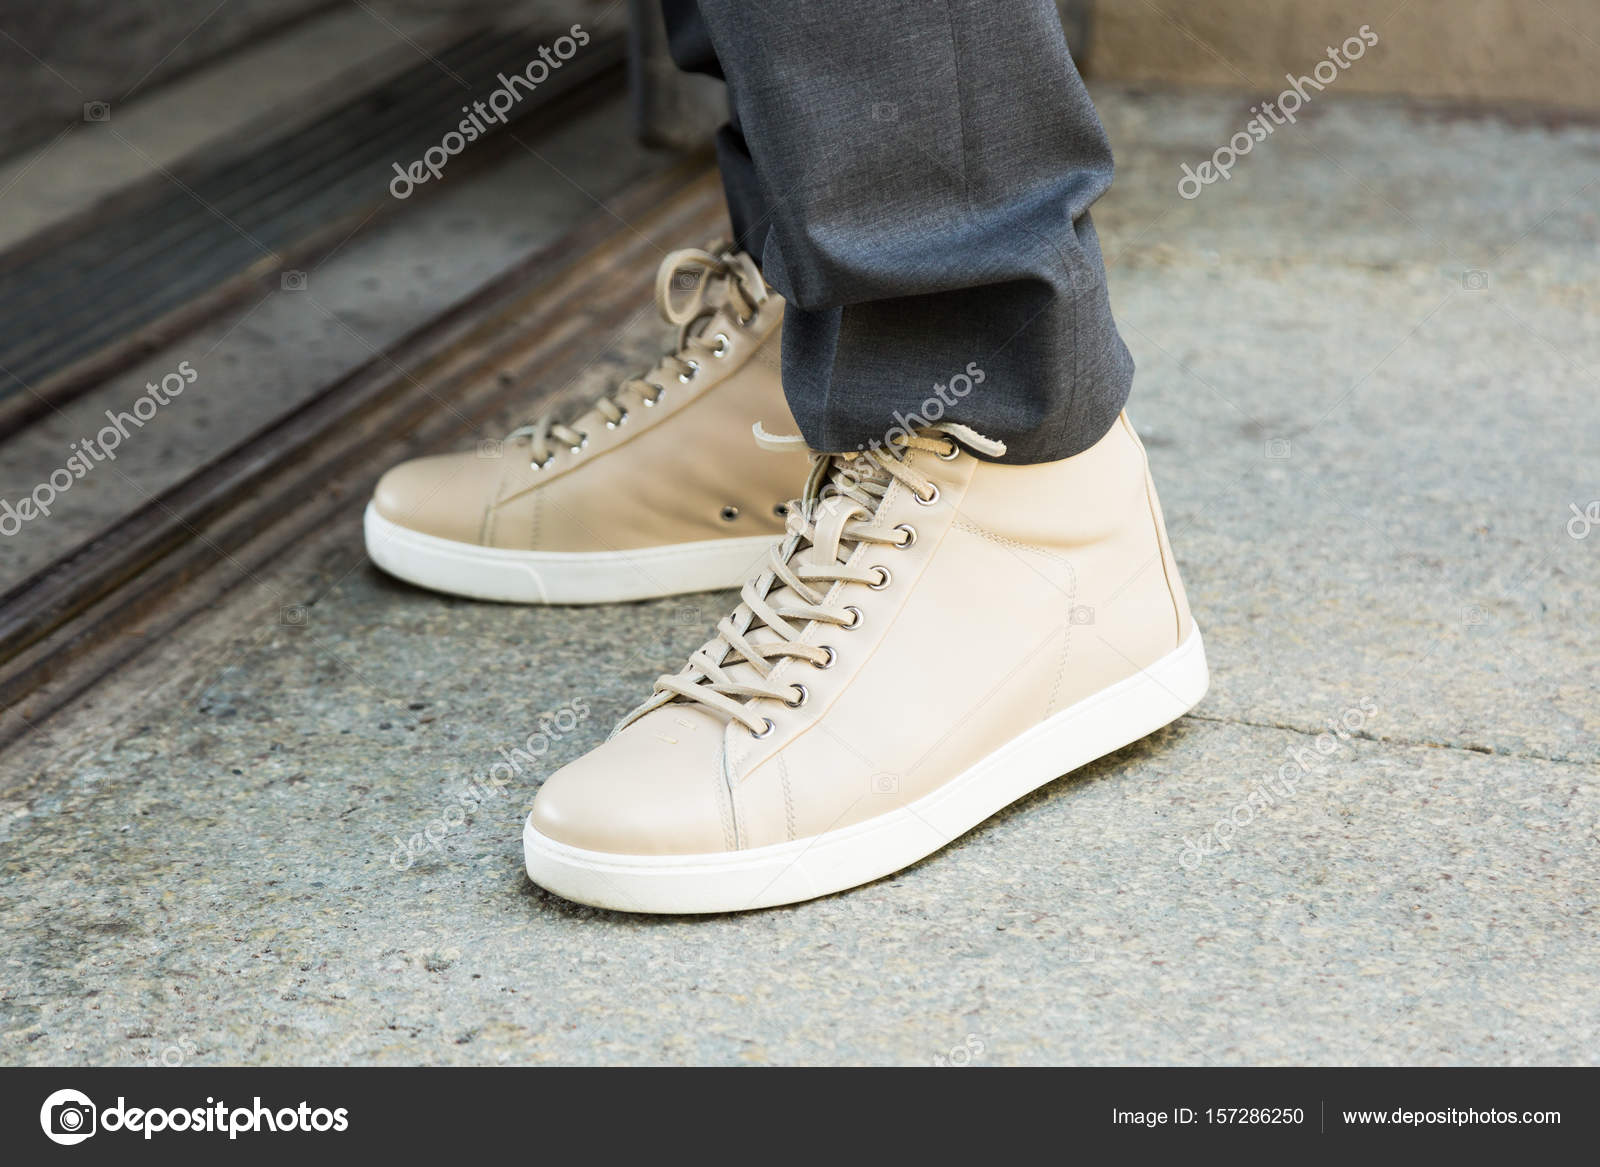 1ab370f75810 Λεπτομέρεια του παπούτσια κατά τη διάρκεια της εβδομάδας μόδας του ...